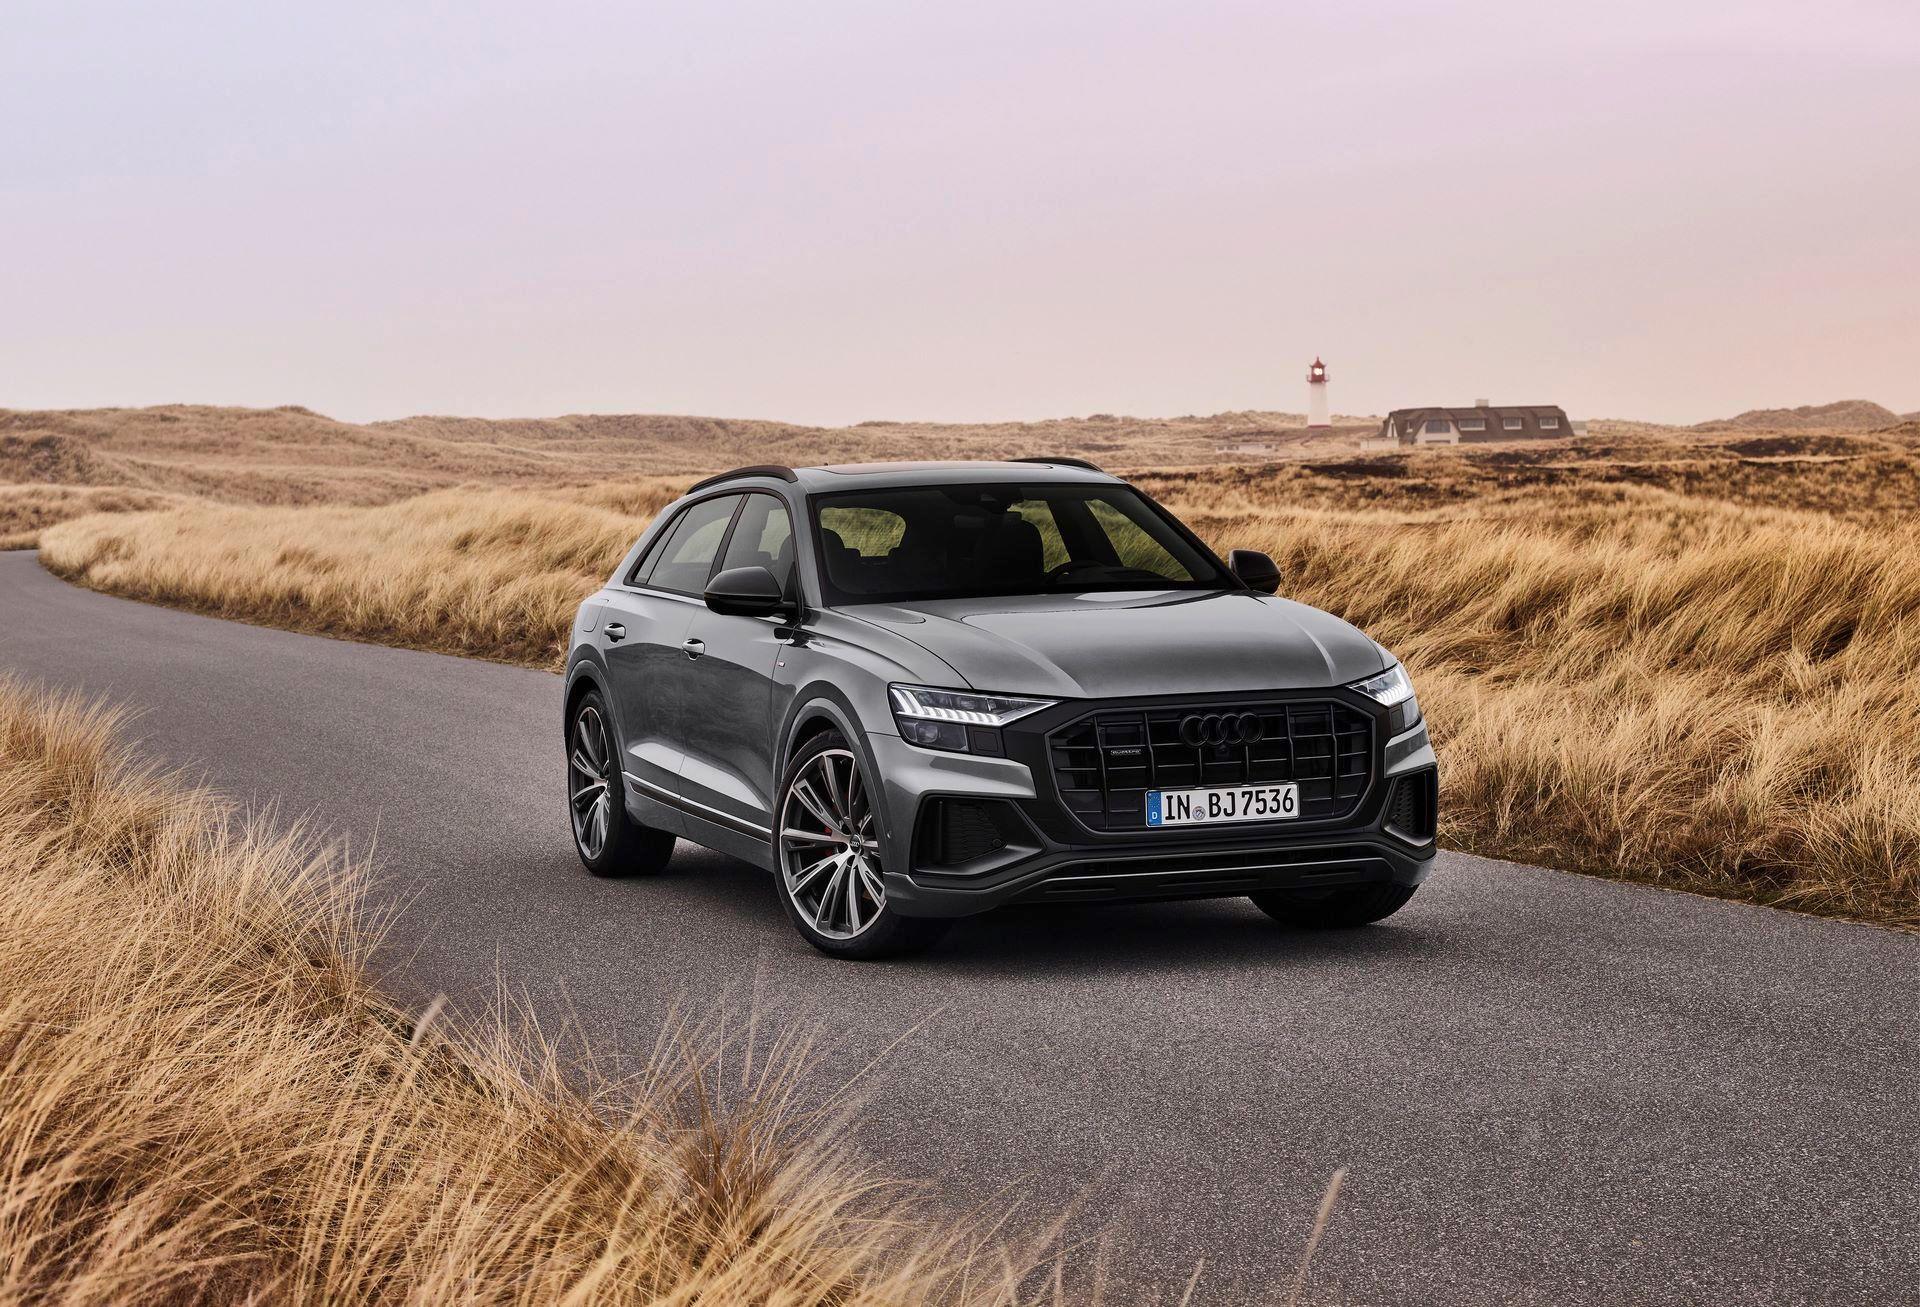 Audi-A4-A5-Q7-Q8-Competition-And-Competition-Plus-Trims-18